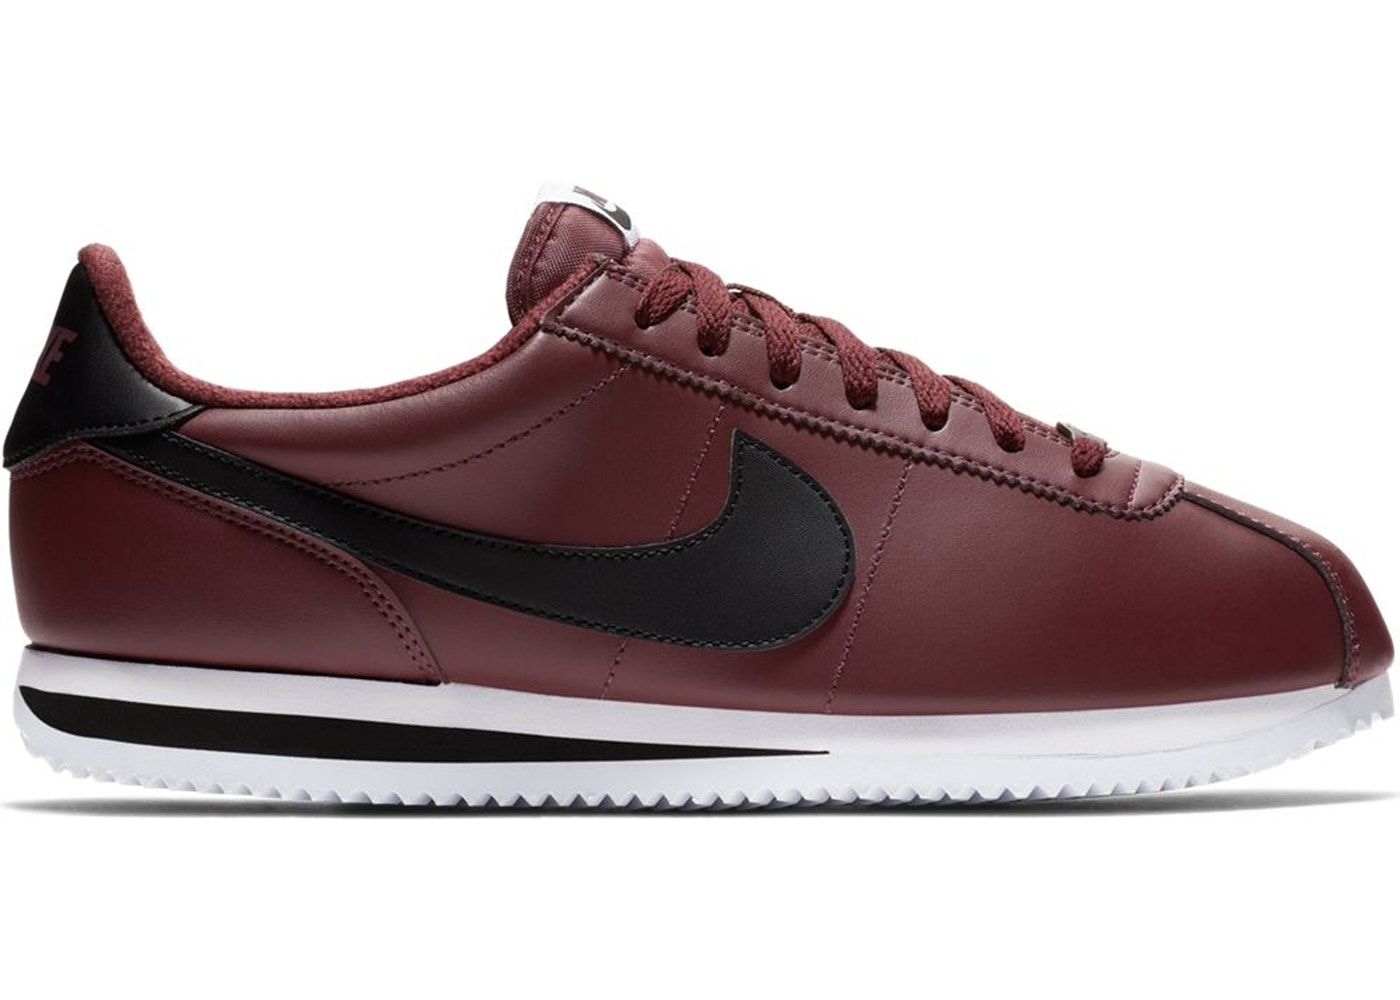 encuentro Ejercicio Leer  Nike Cortez Leather Burgundy Crush - 819719-600